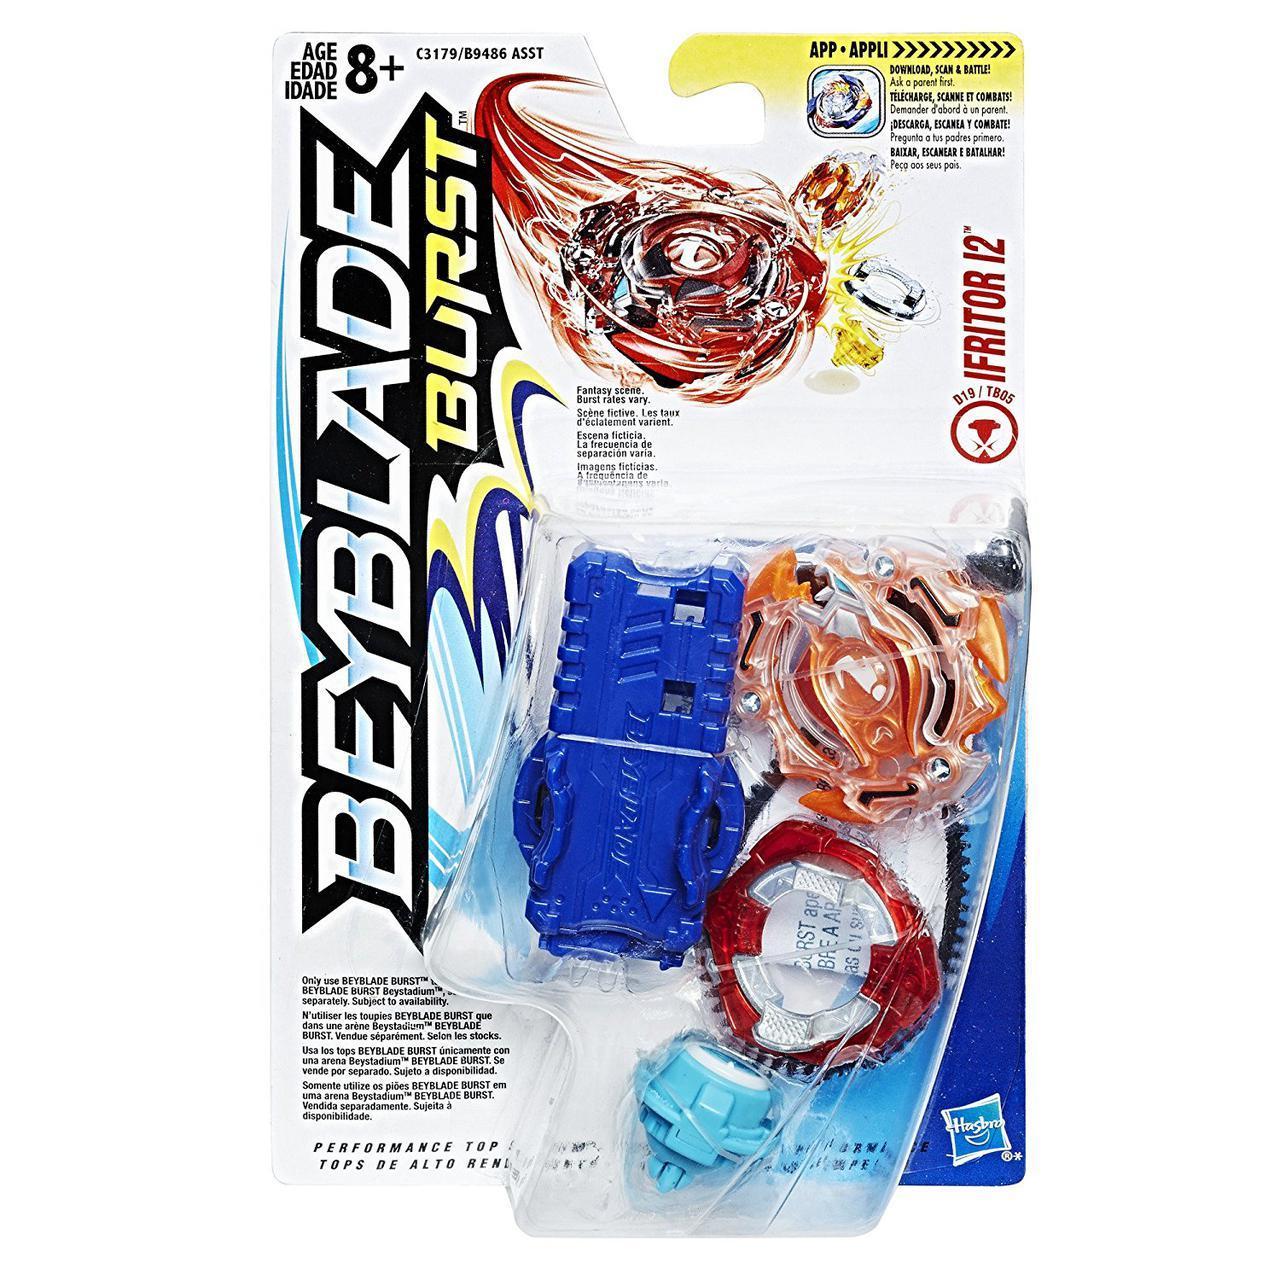 Волчок Бейблейд Взрыв Ифритор с пускателем Beyblade Burst Starter Pack Ifritor I2